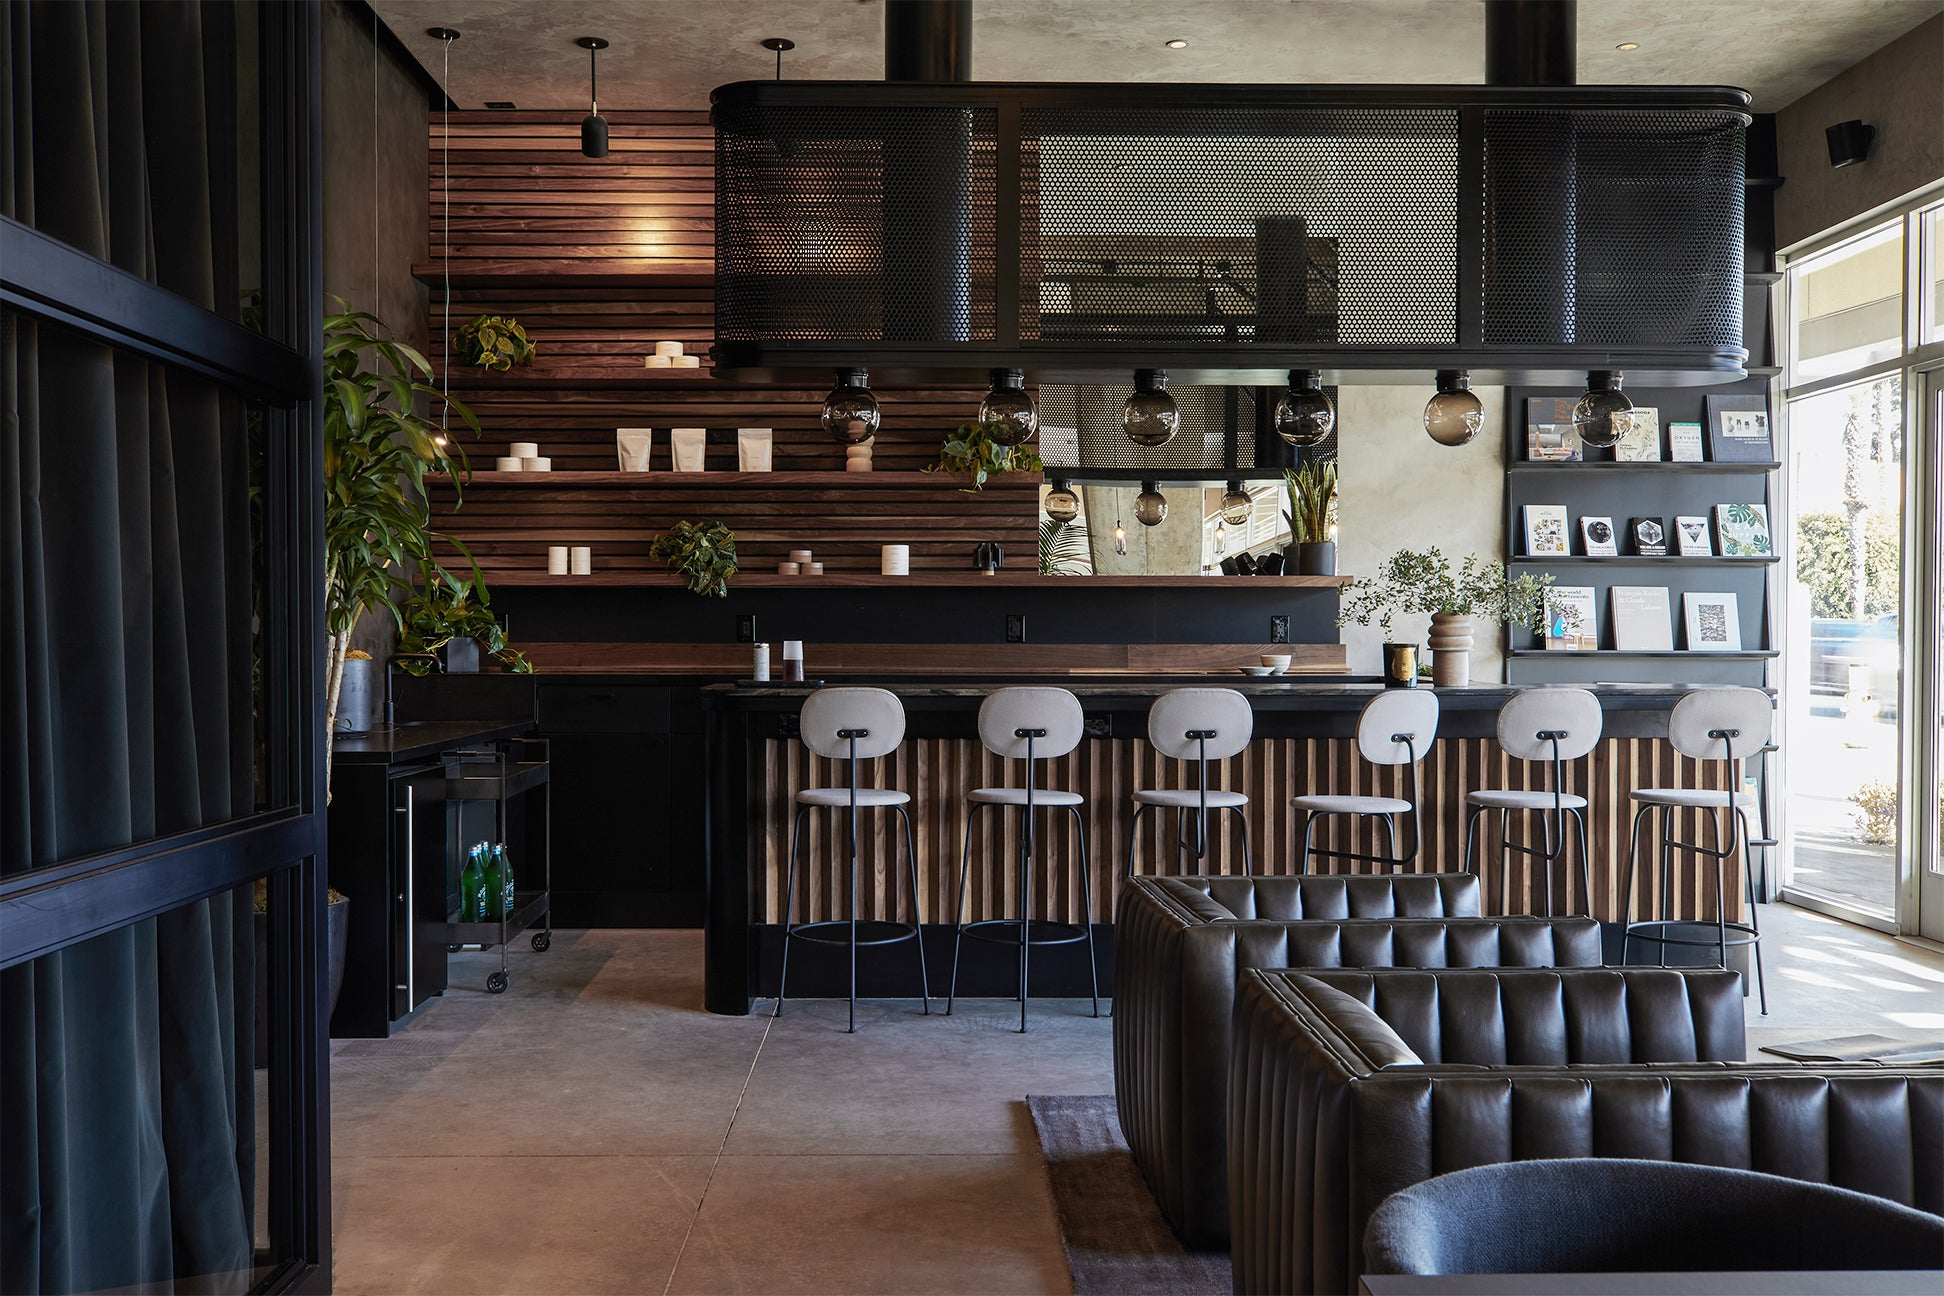 Chic wood-toned bar